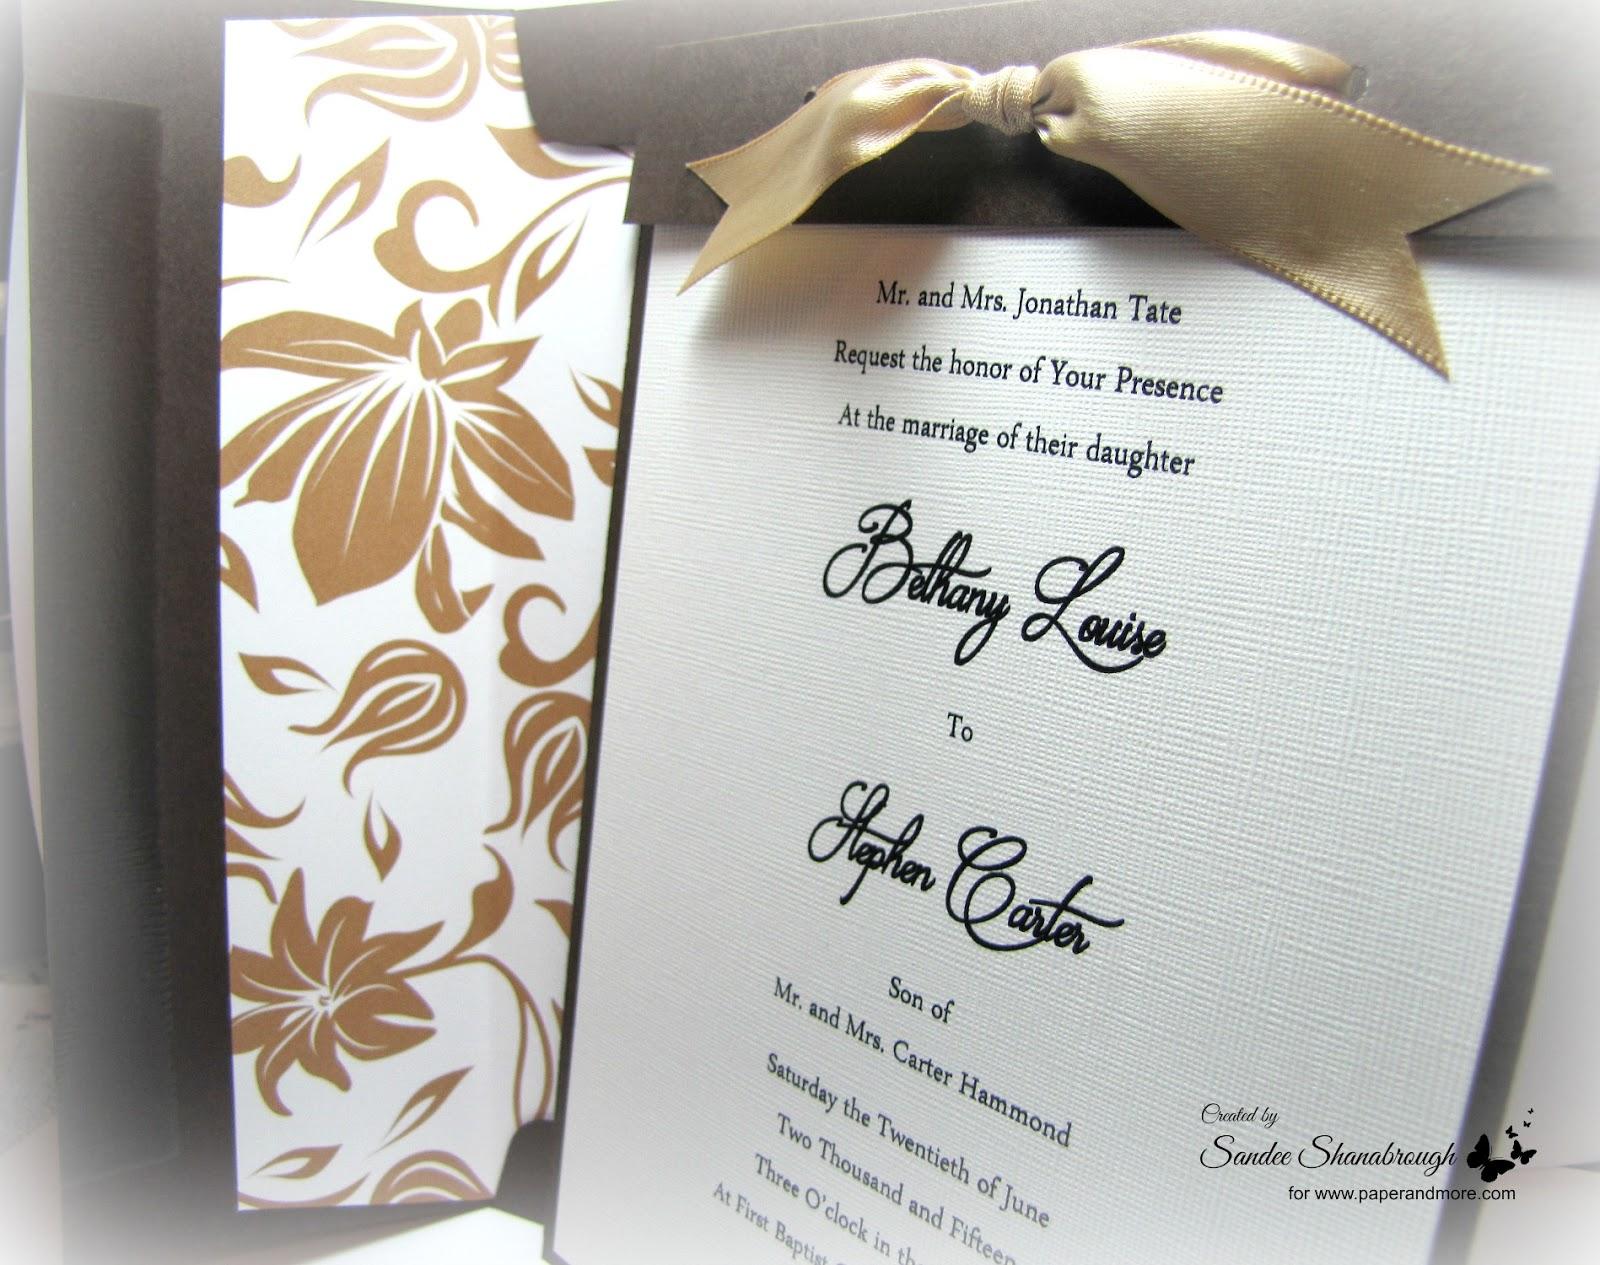 Simply Southern Sandee: An Easy DIY Wedding Invitation